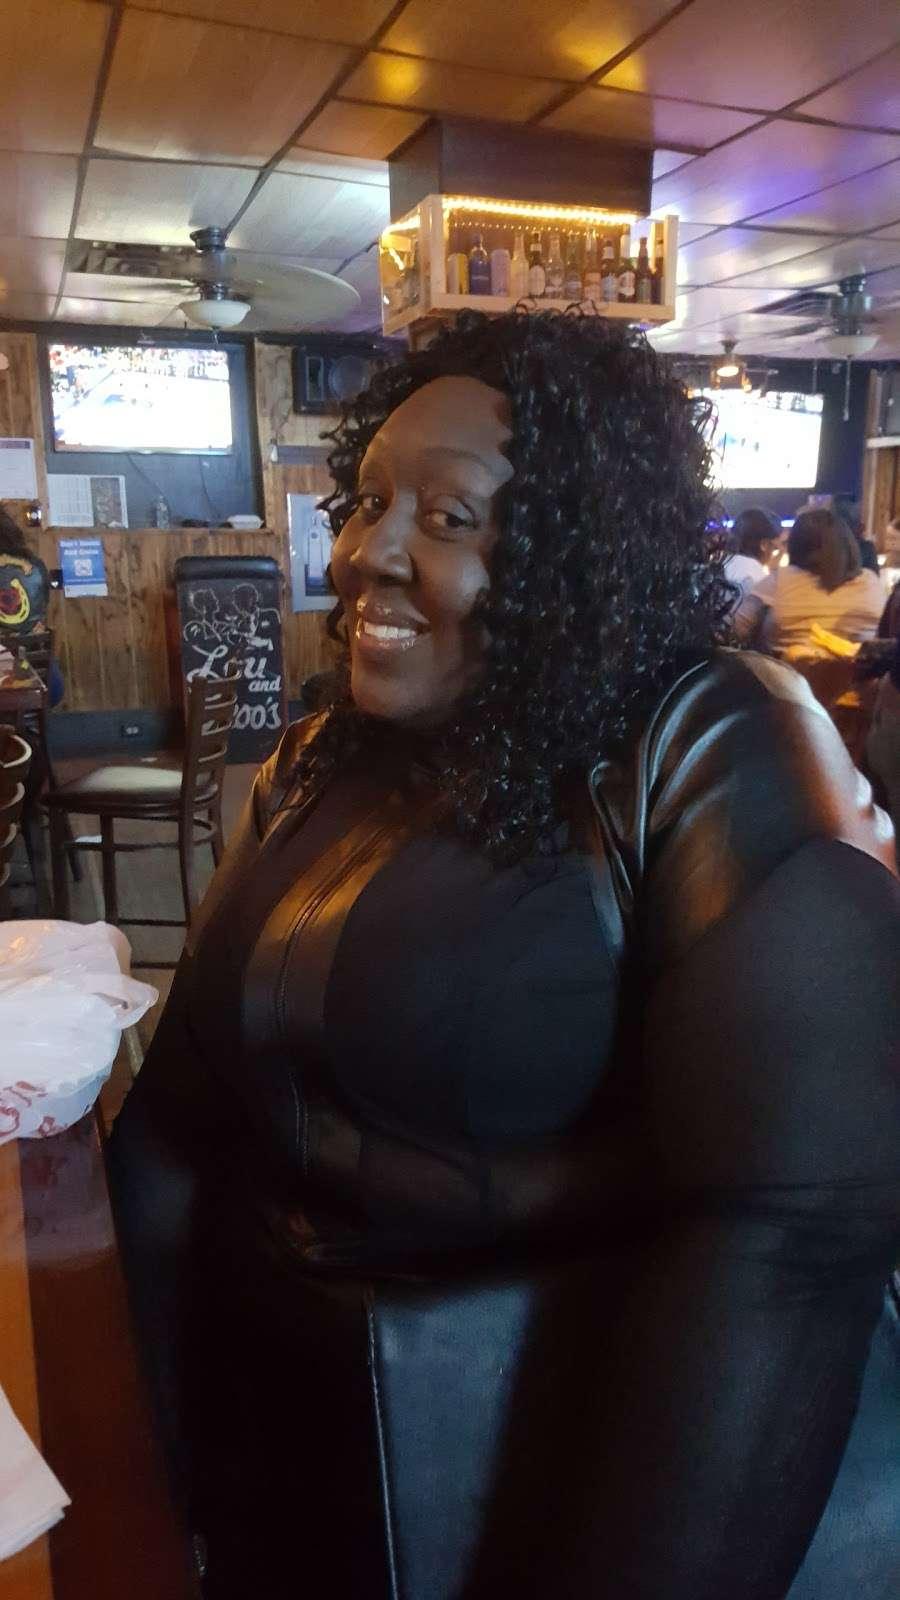 Lou & Choo Lounge - night club  | Photo 4 of 10 | Address: 2101 W Hunting Park Ave, Philadelphia, PA 19140, USA | Phone: (215) 228-7281